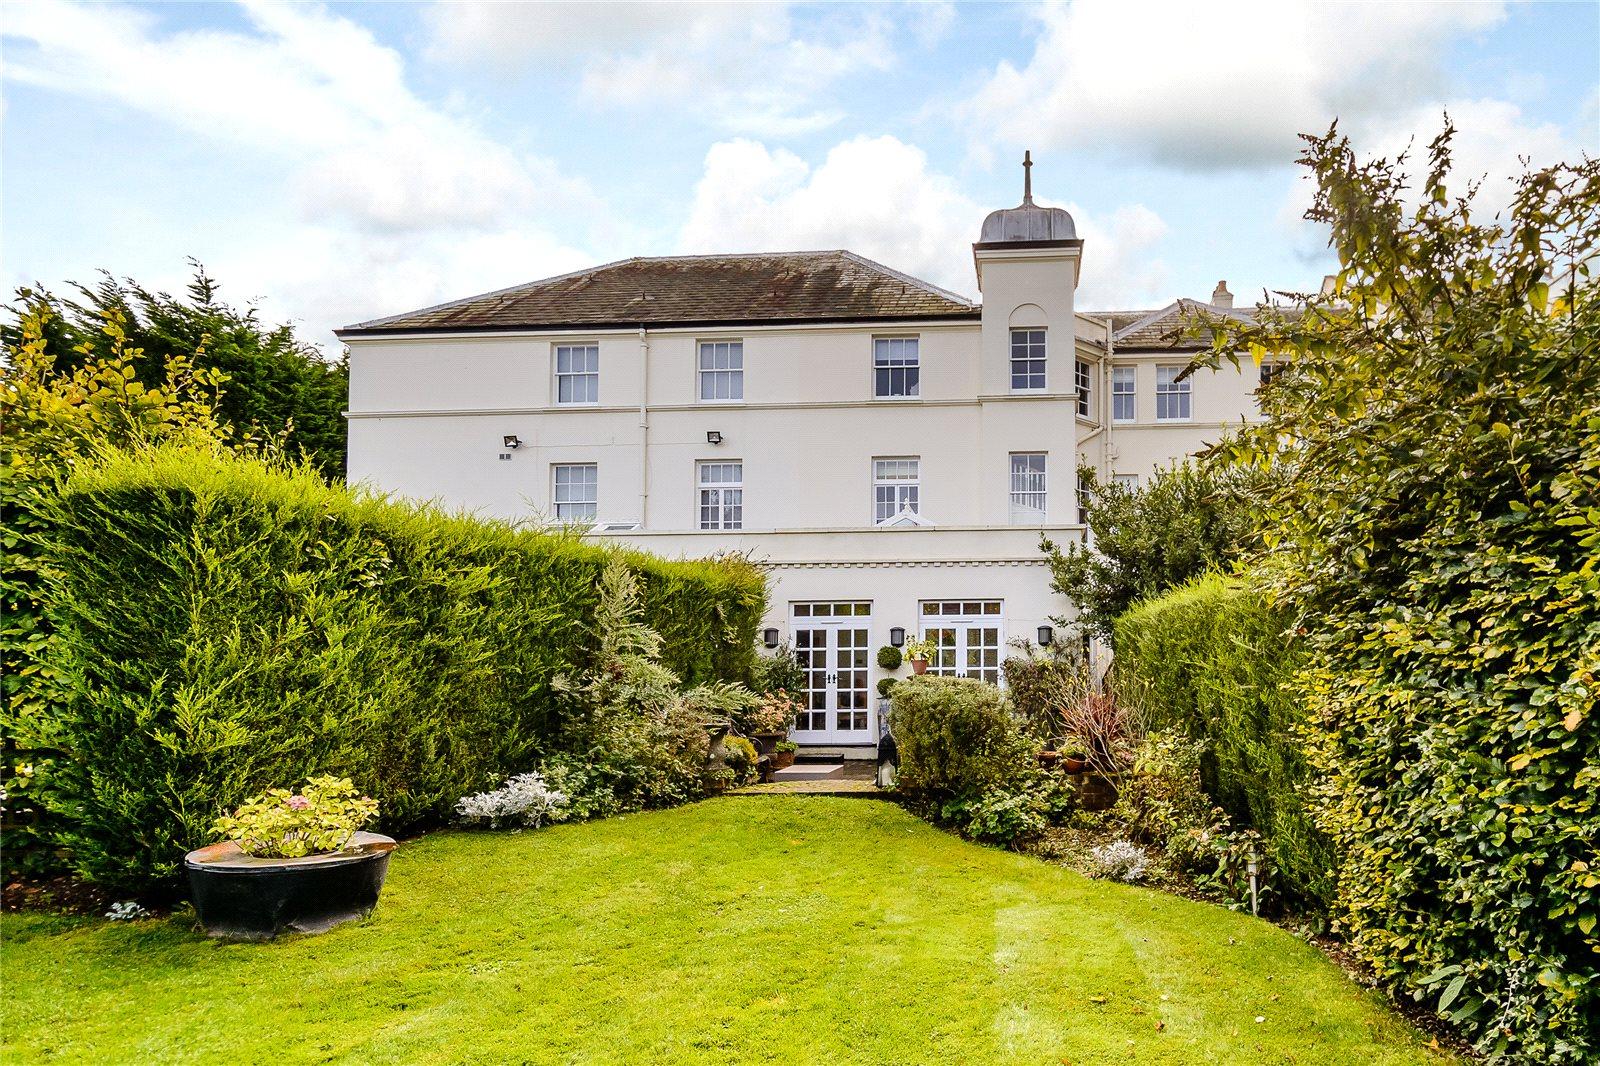 Casa para uma família para Venda às Grace Avenue, Shenley, Radlett, Hertfordshire, WD7 Radlett, Inglaterra